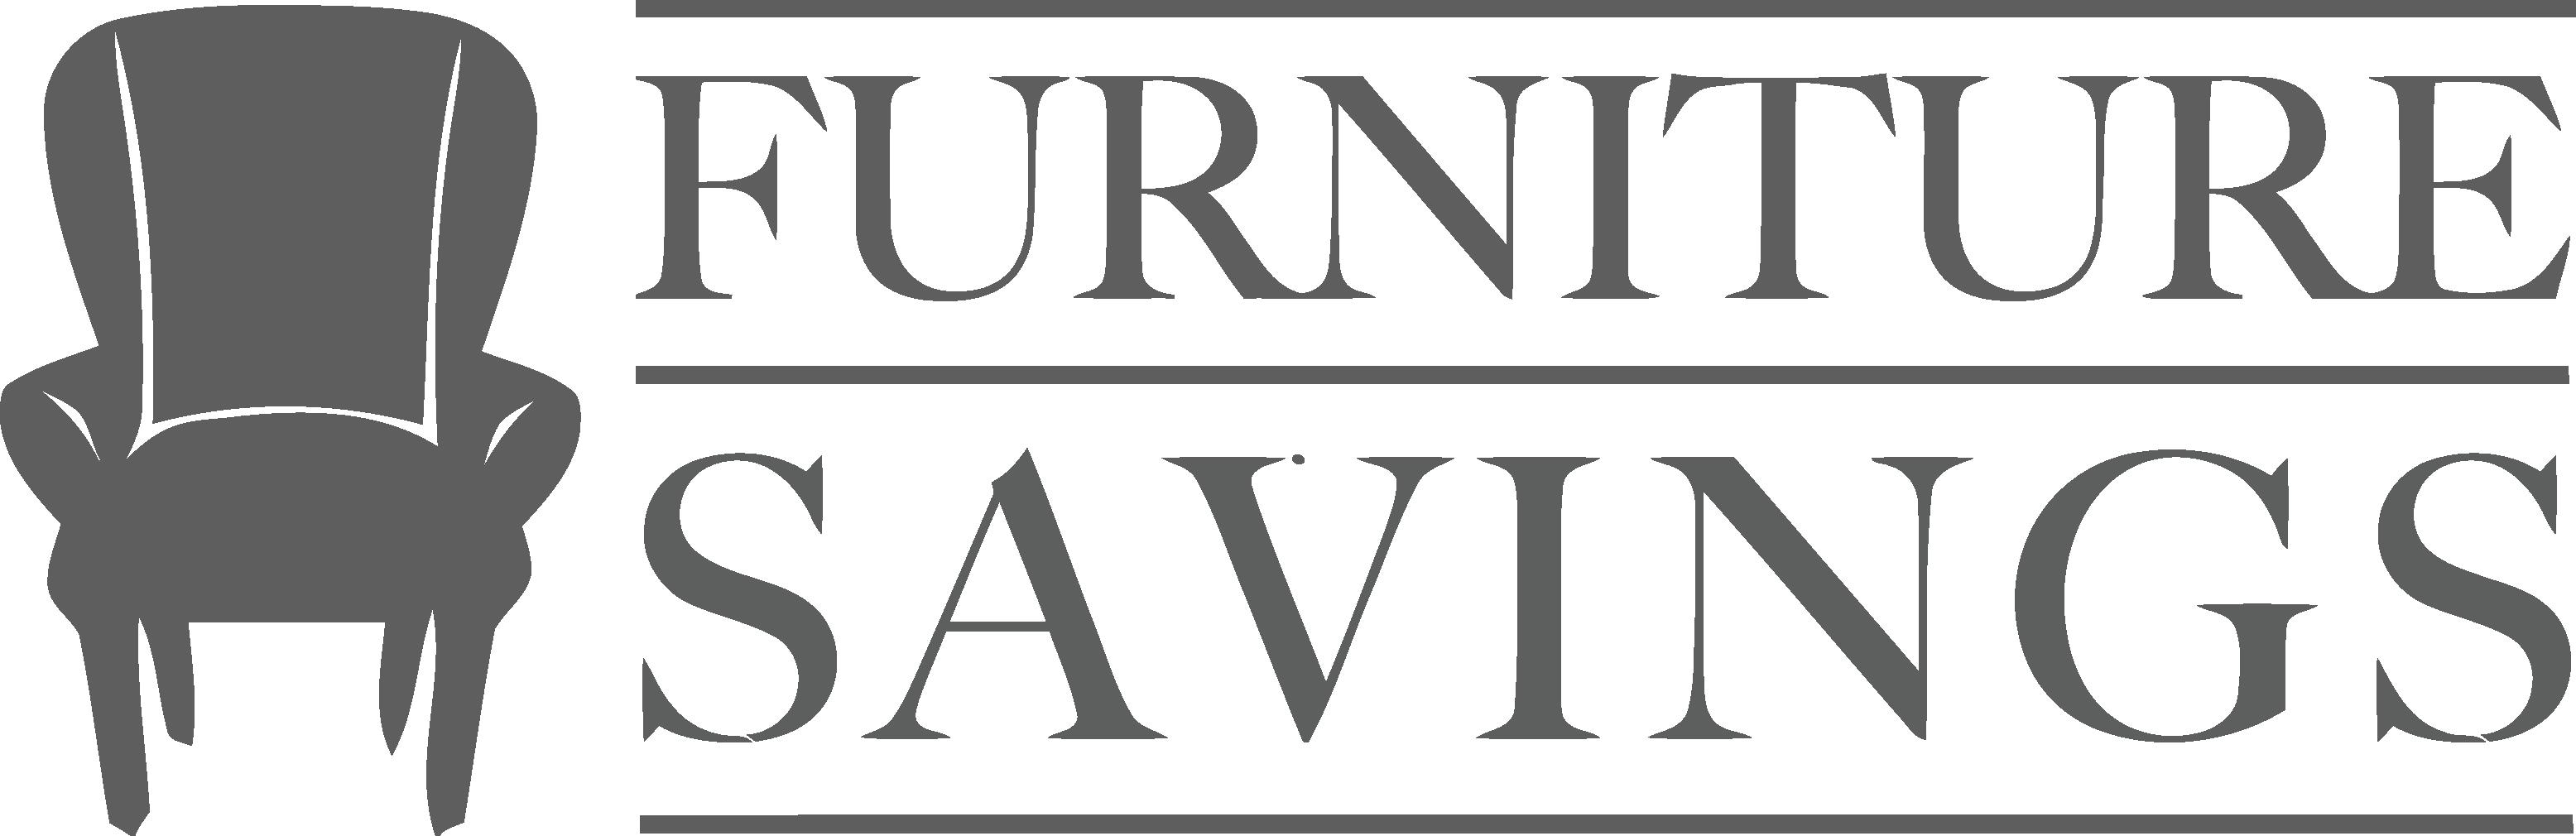 Furniture Savings - Cheap Furniture Online Australia